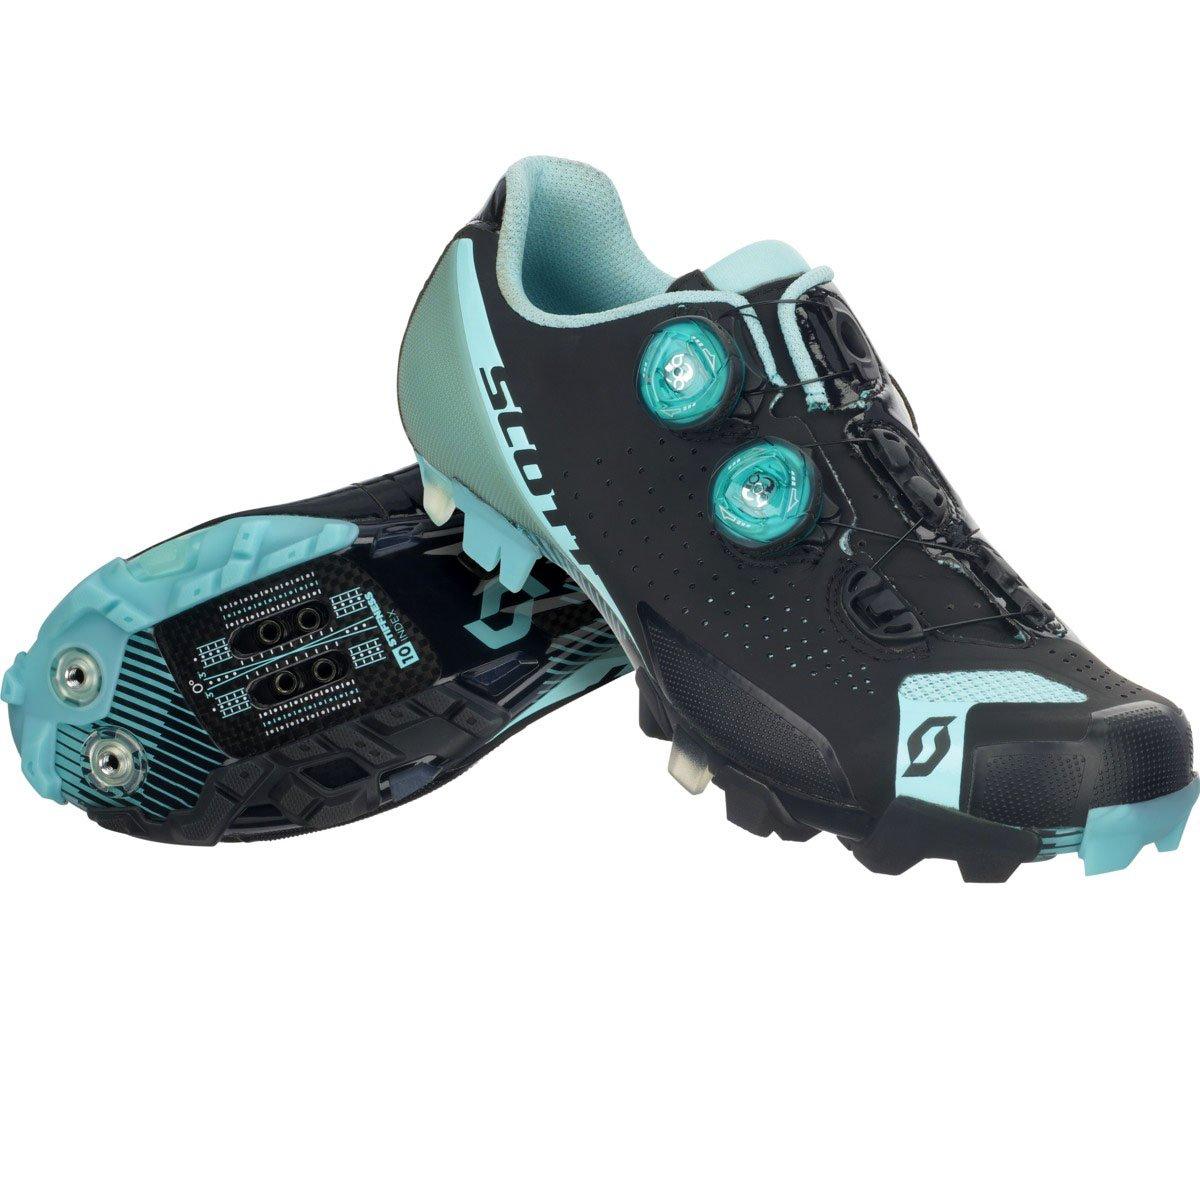 37.0 Womens Matte Black//Turquoise Blue Scott MTB RC Lady Shoe